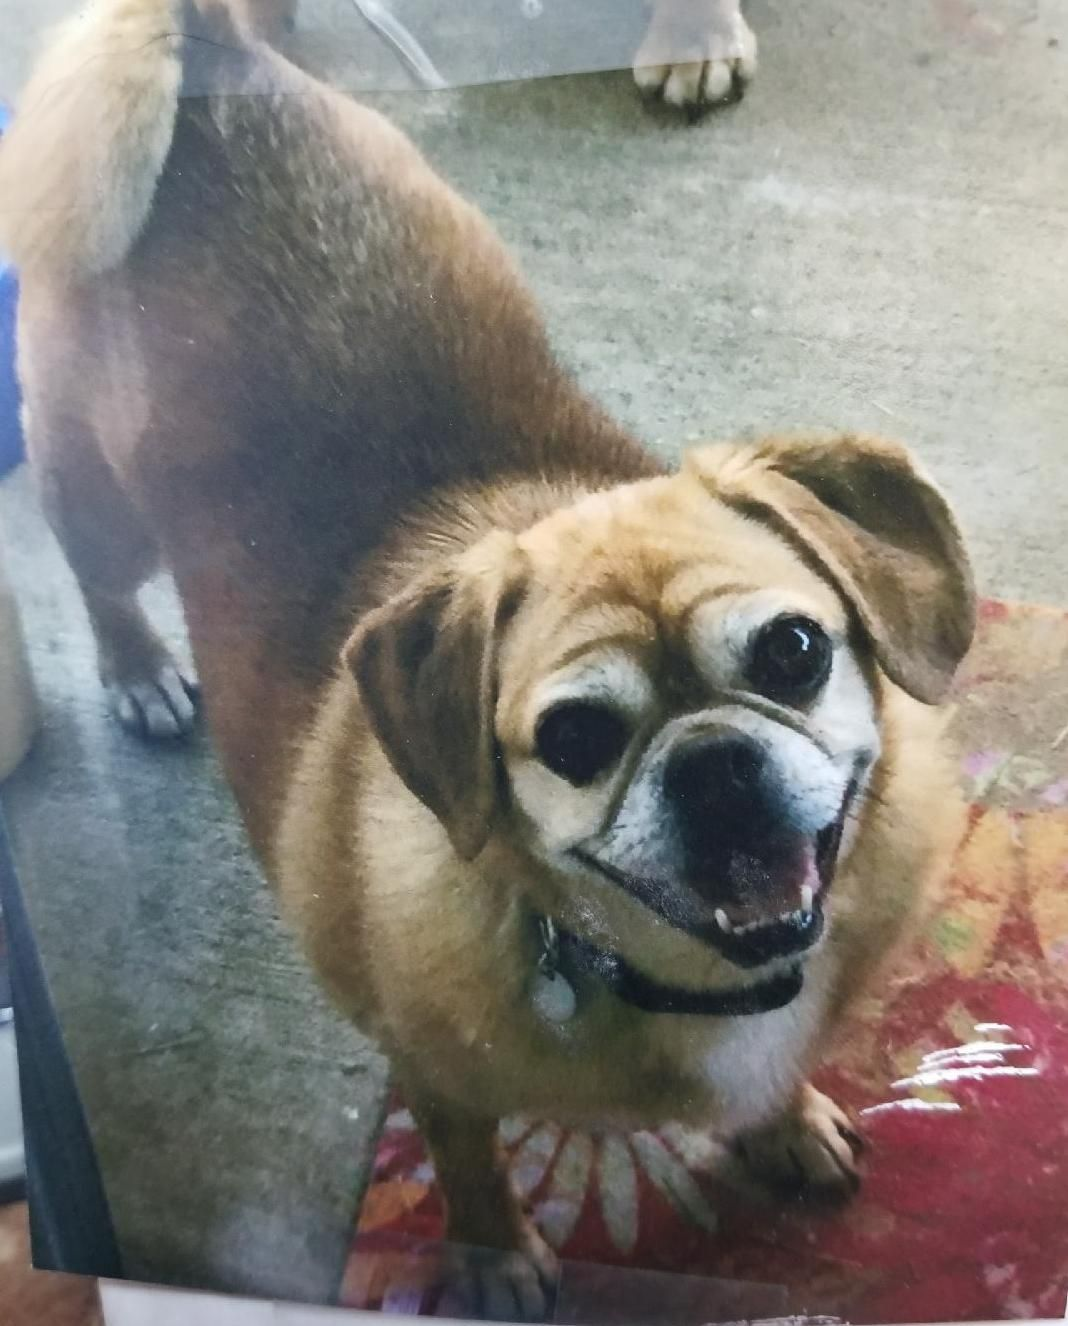 Puggle Dog For Adoption In Pawtucket Ri Adn 621641 On